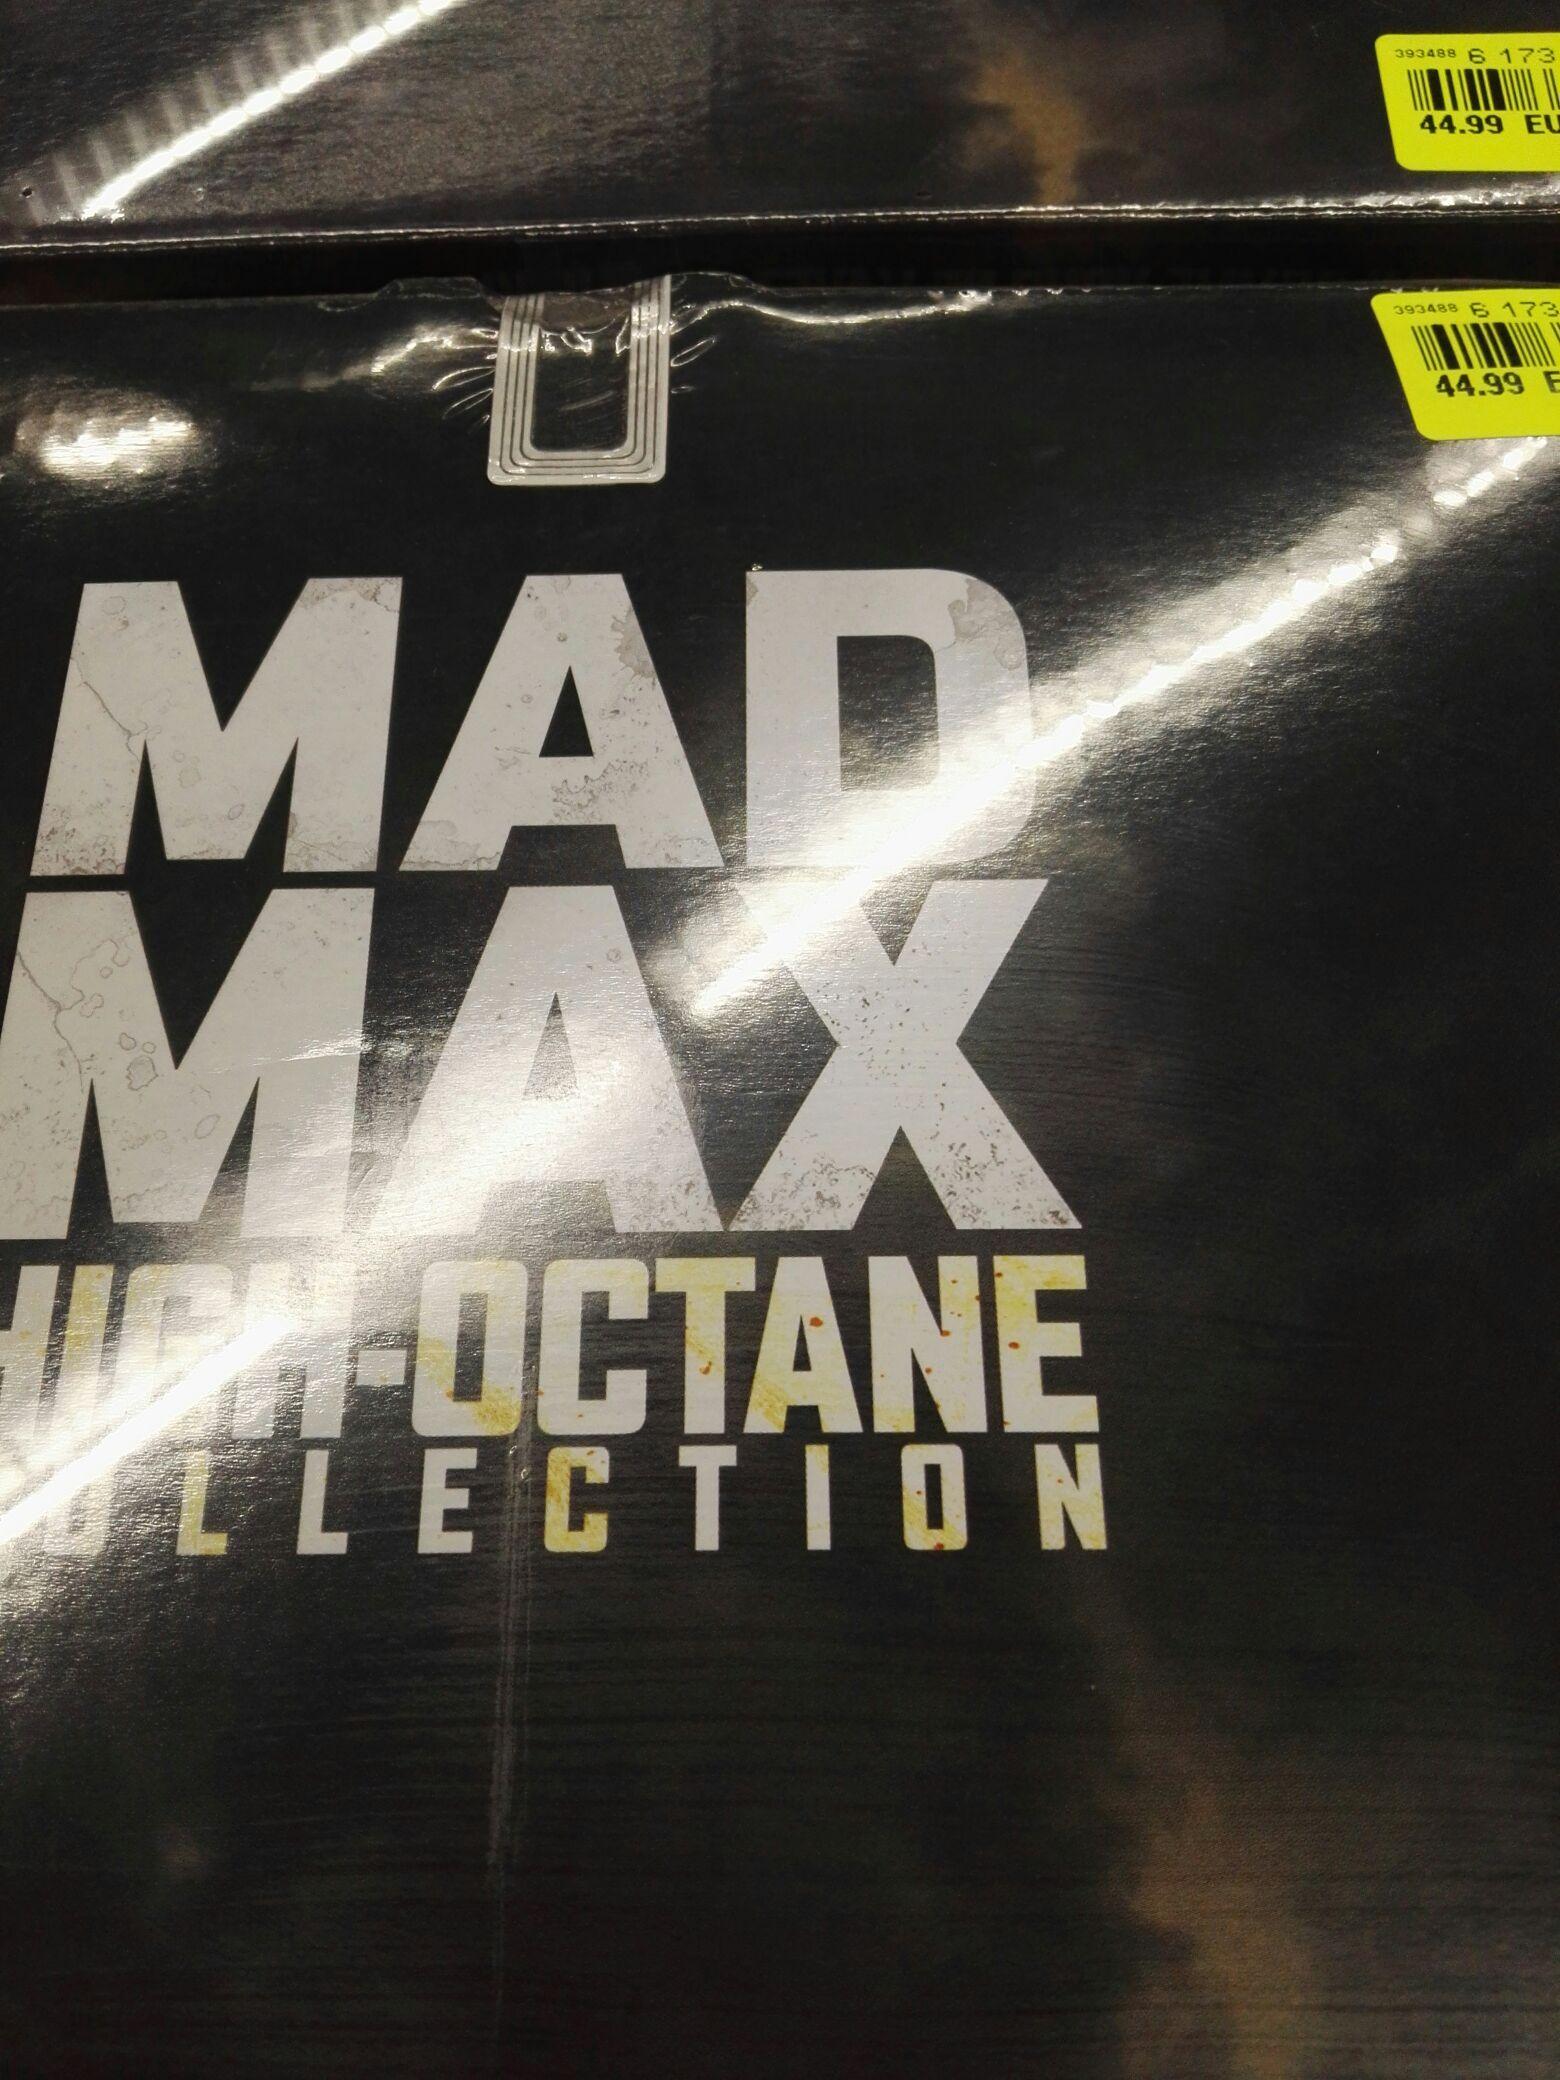 "Coffret Mad Max Anthologie High-Octane Collection - Edition limitée coffret voiture et version inédite ""Black and Chrome"" du film Mad Max Fury Road - Noz Augny (57), Mozac (63)"